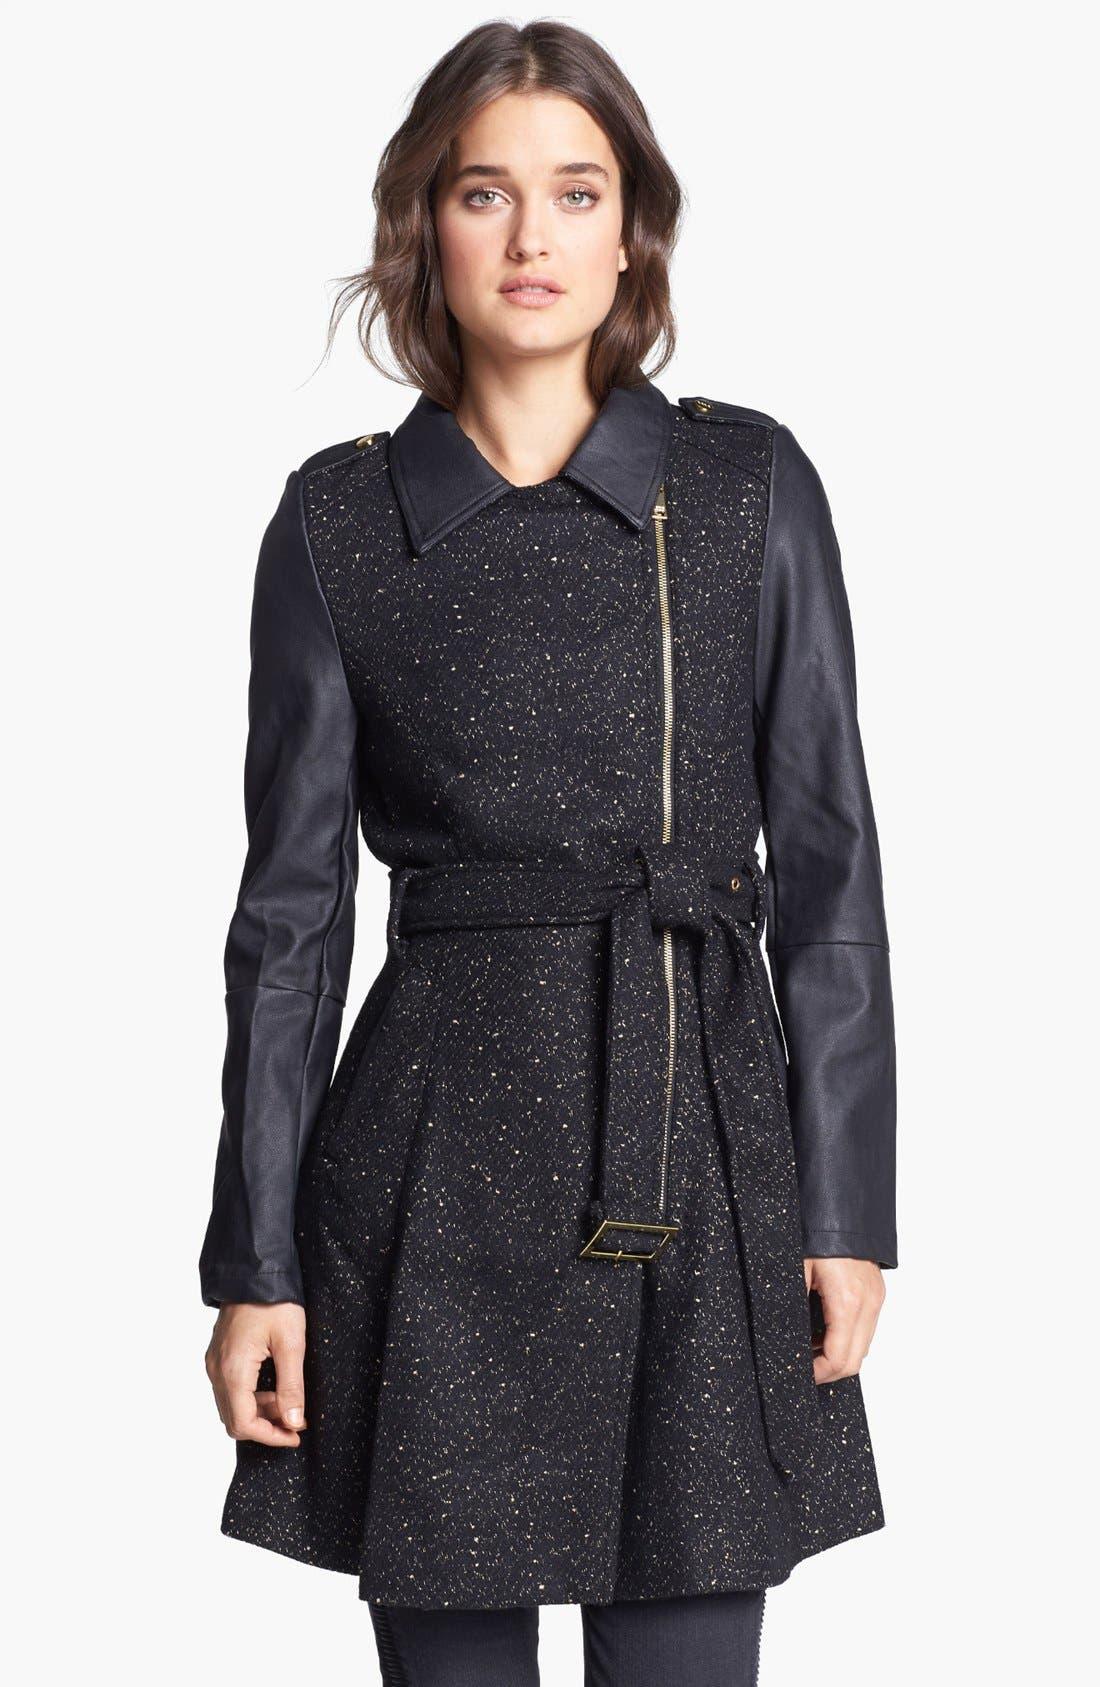 Alternate Image 1 Selected - bebe Asymmetrical Tweed & Faux Leather Coat